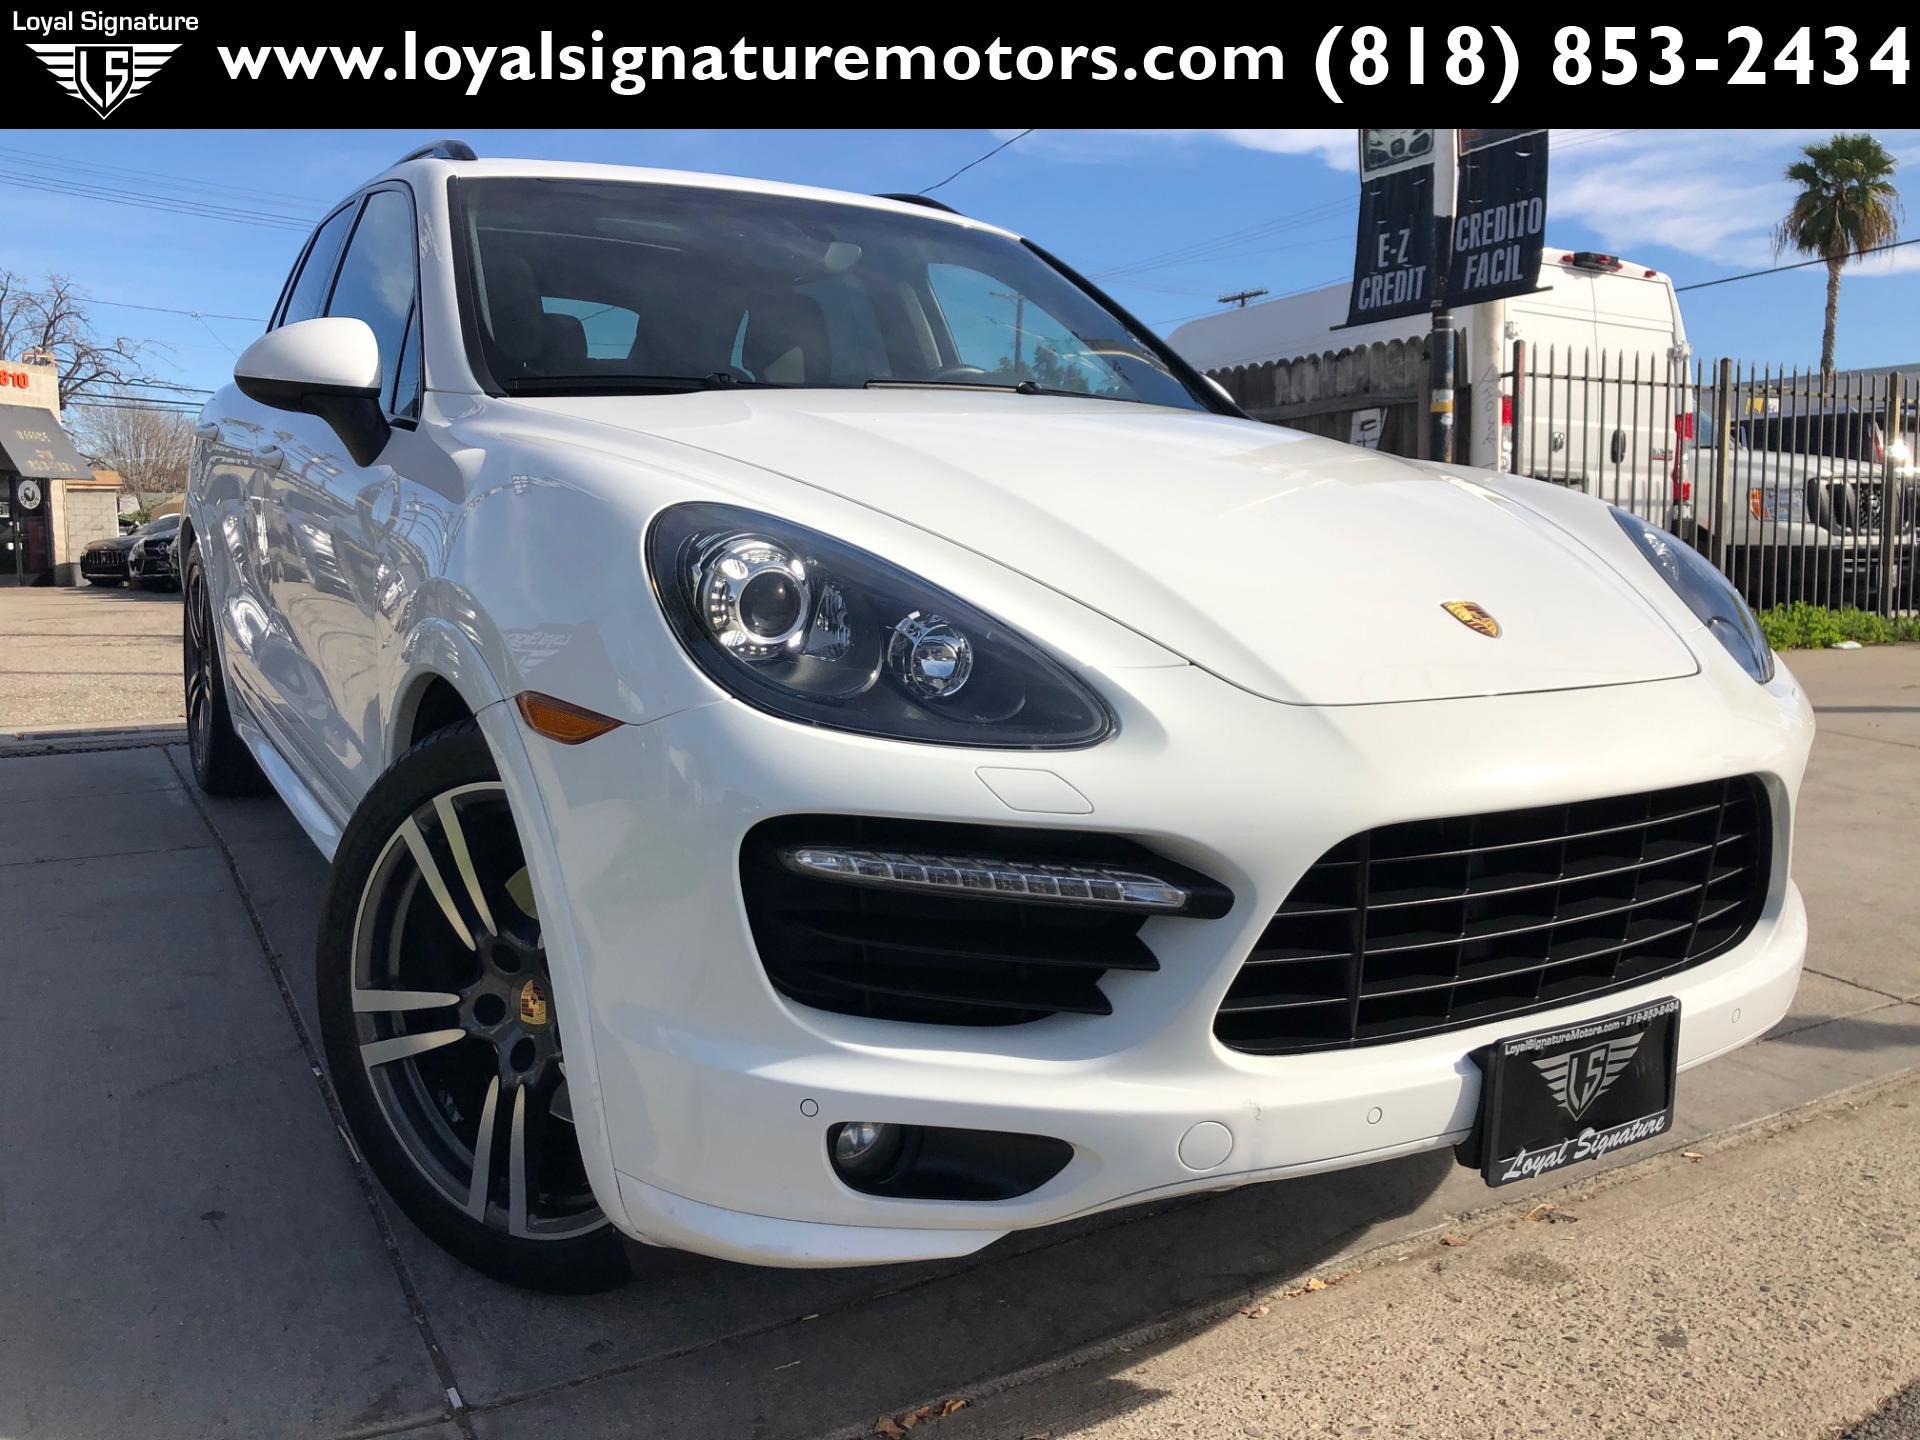 Used 2013 Porsche Cayenne GTS | Van Nuys, CA